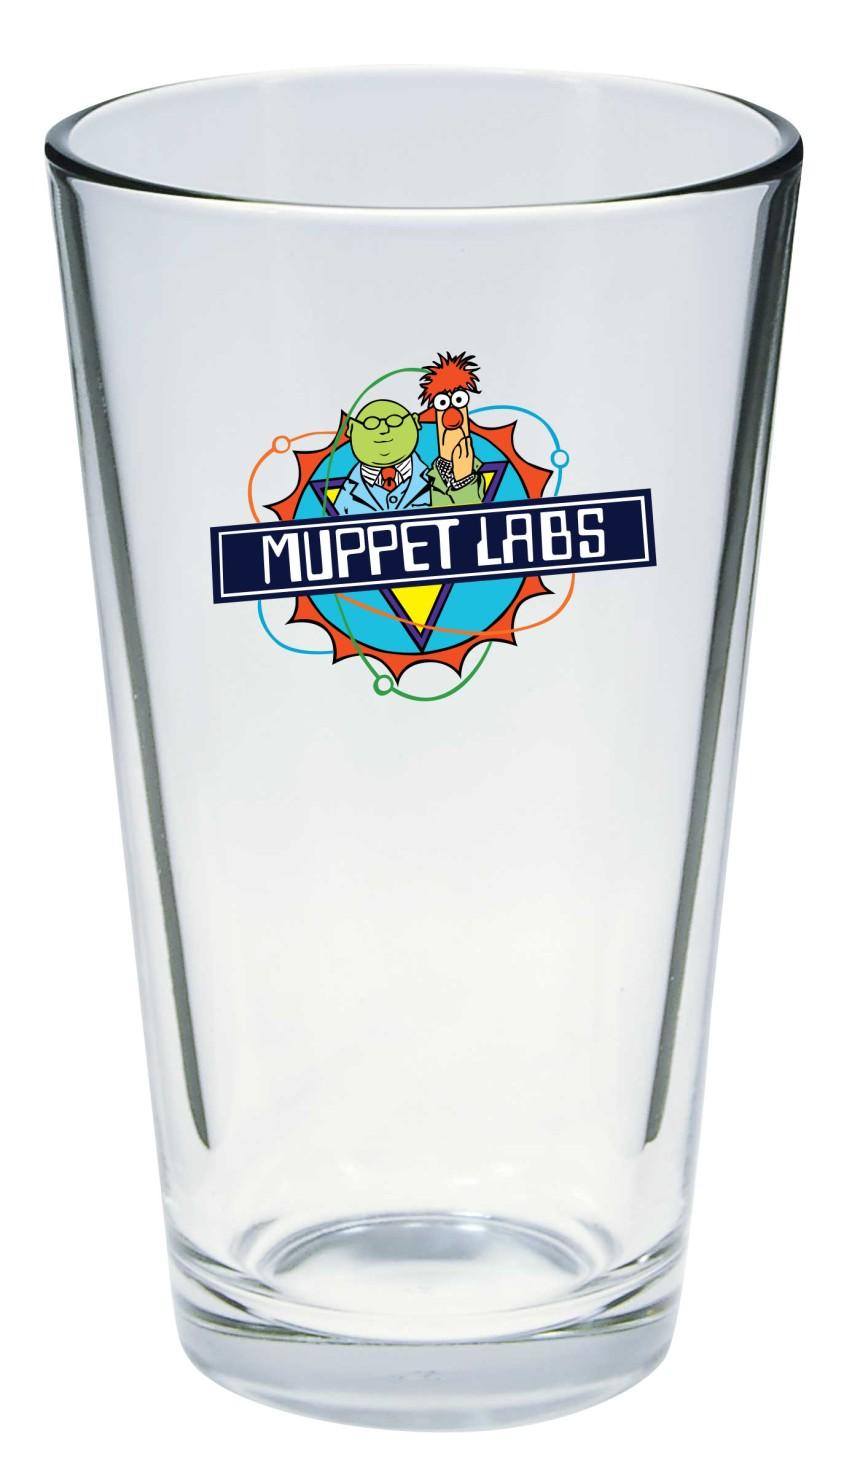 MuppetLabsPintGlass